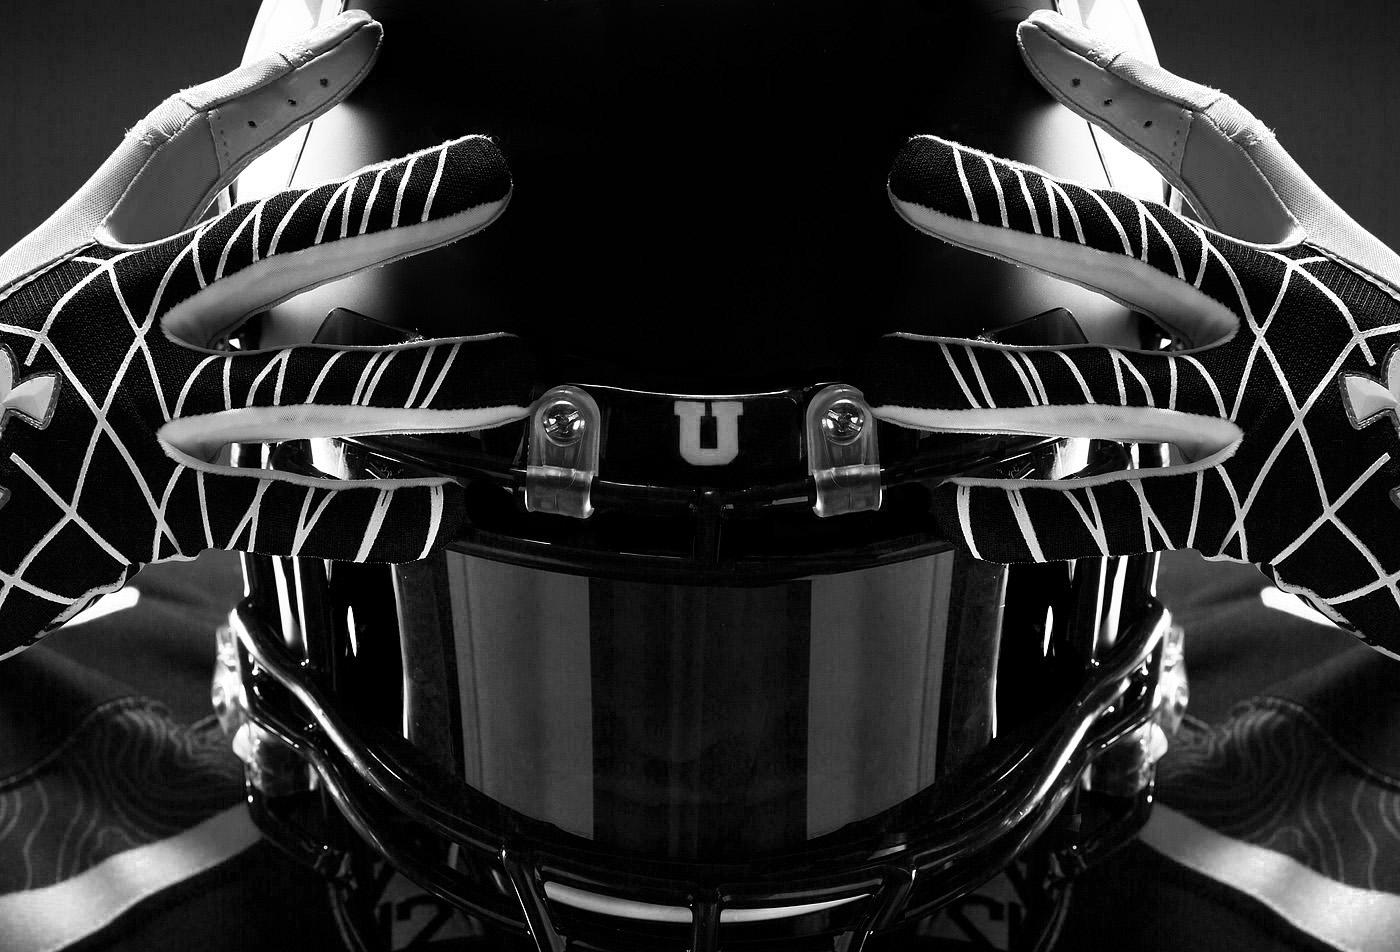 Under Armour football utah school pac12 sport action Nike athlete Hall of Fame muscles university of utah american college football nfl